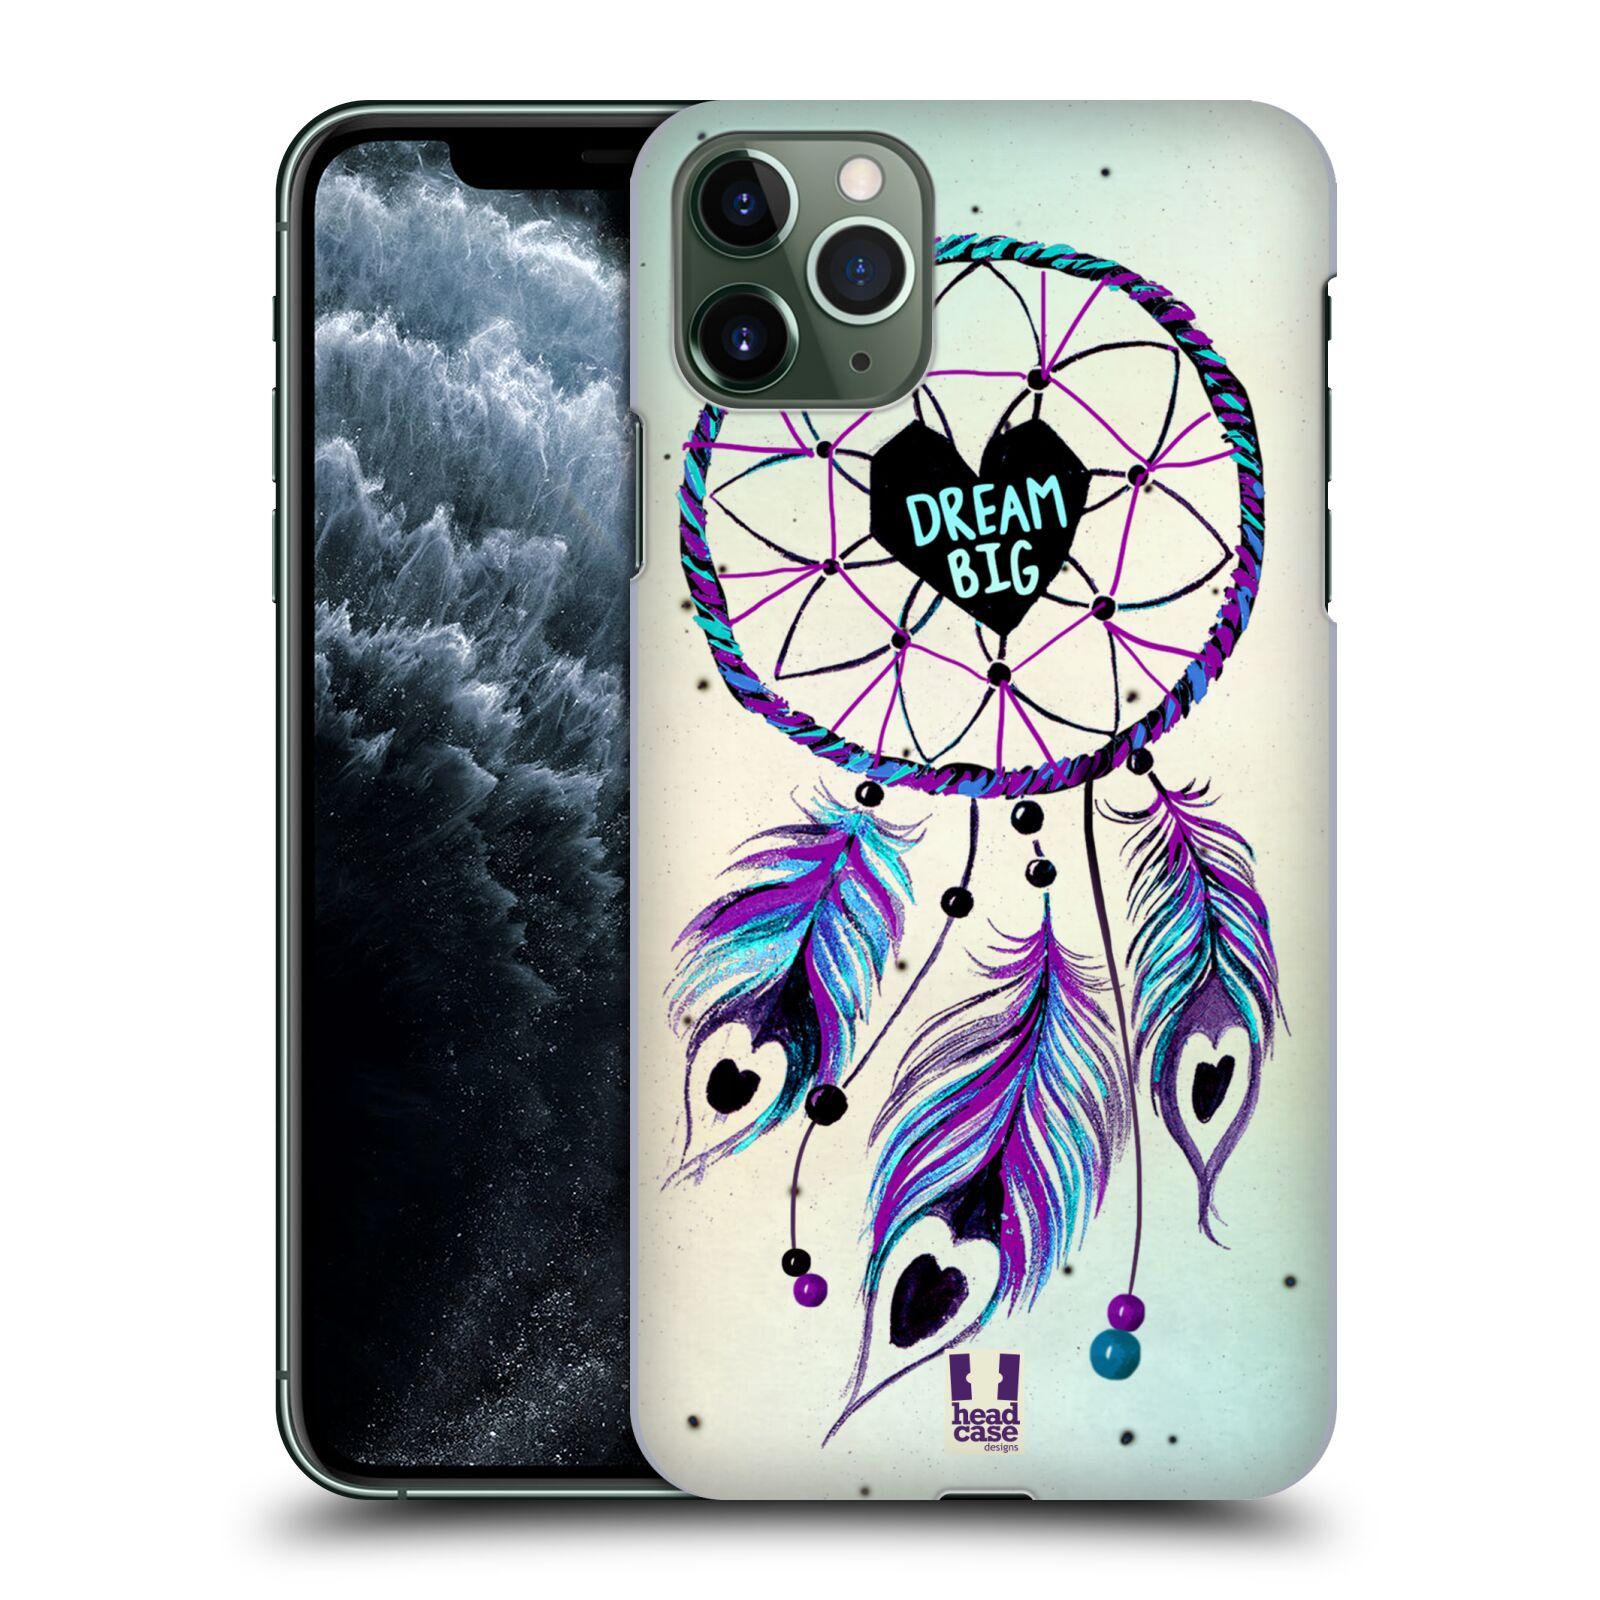 Plastové pouzdro na mobil Apple iPhone 11 Pro Max - Head Case - Lapač Assorted Dream Big Srdce